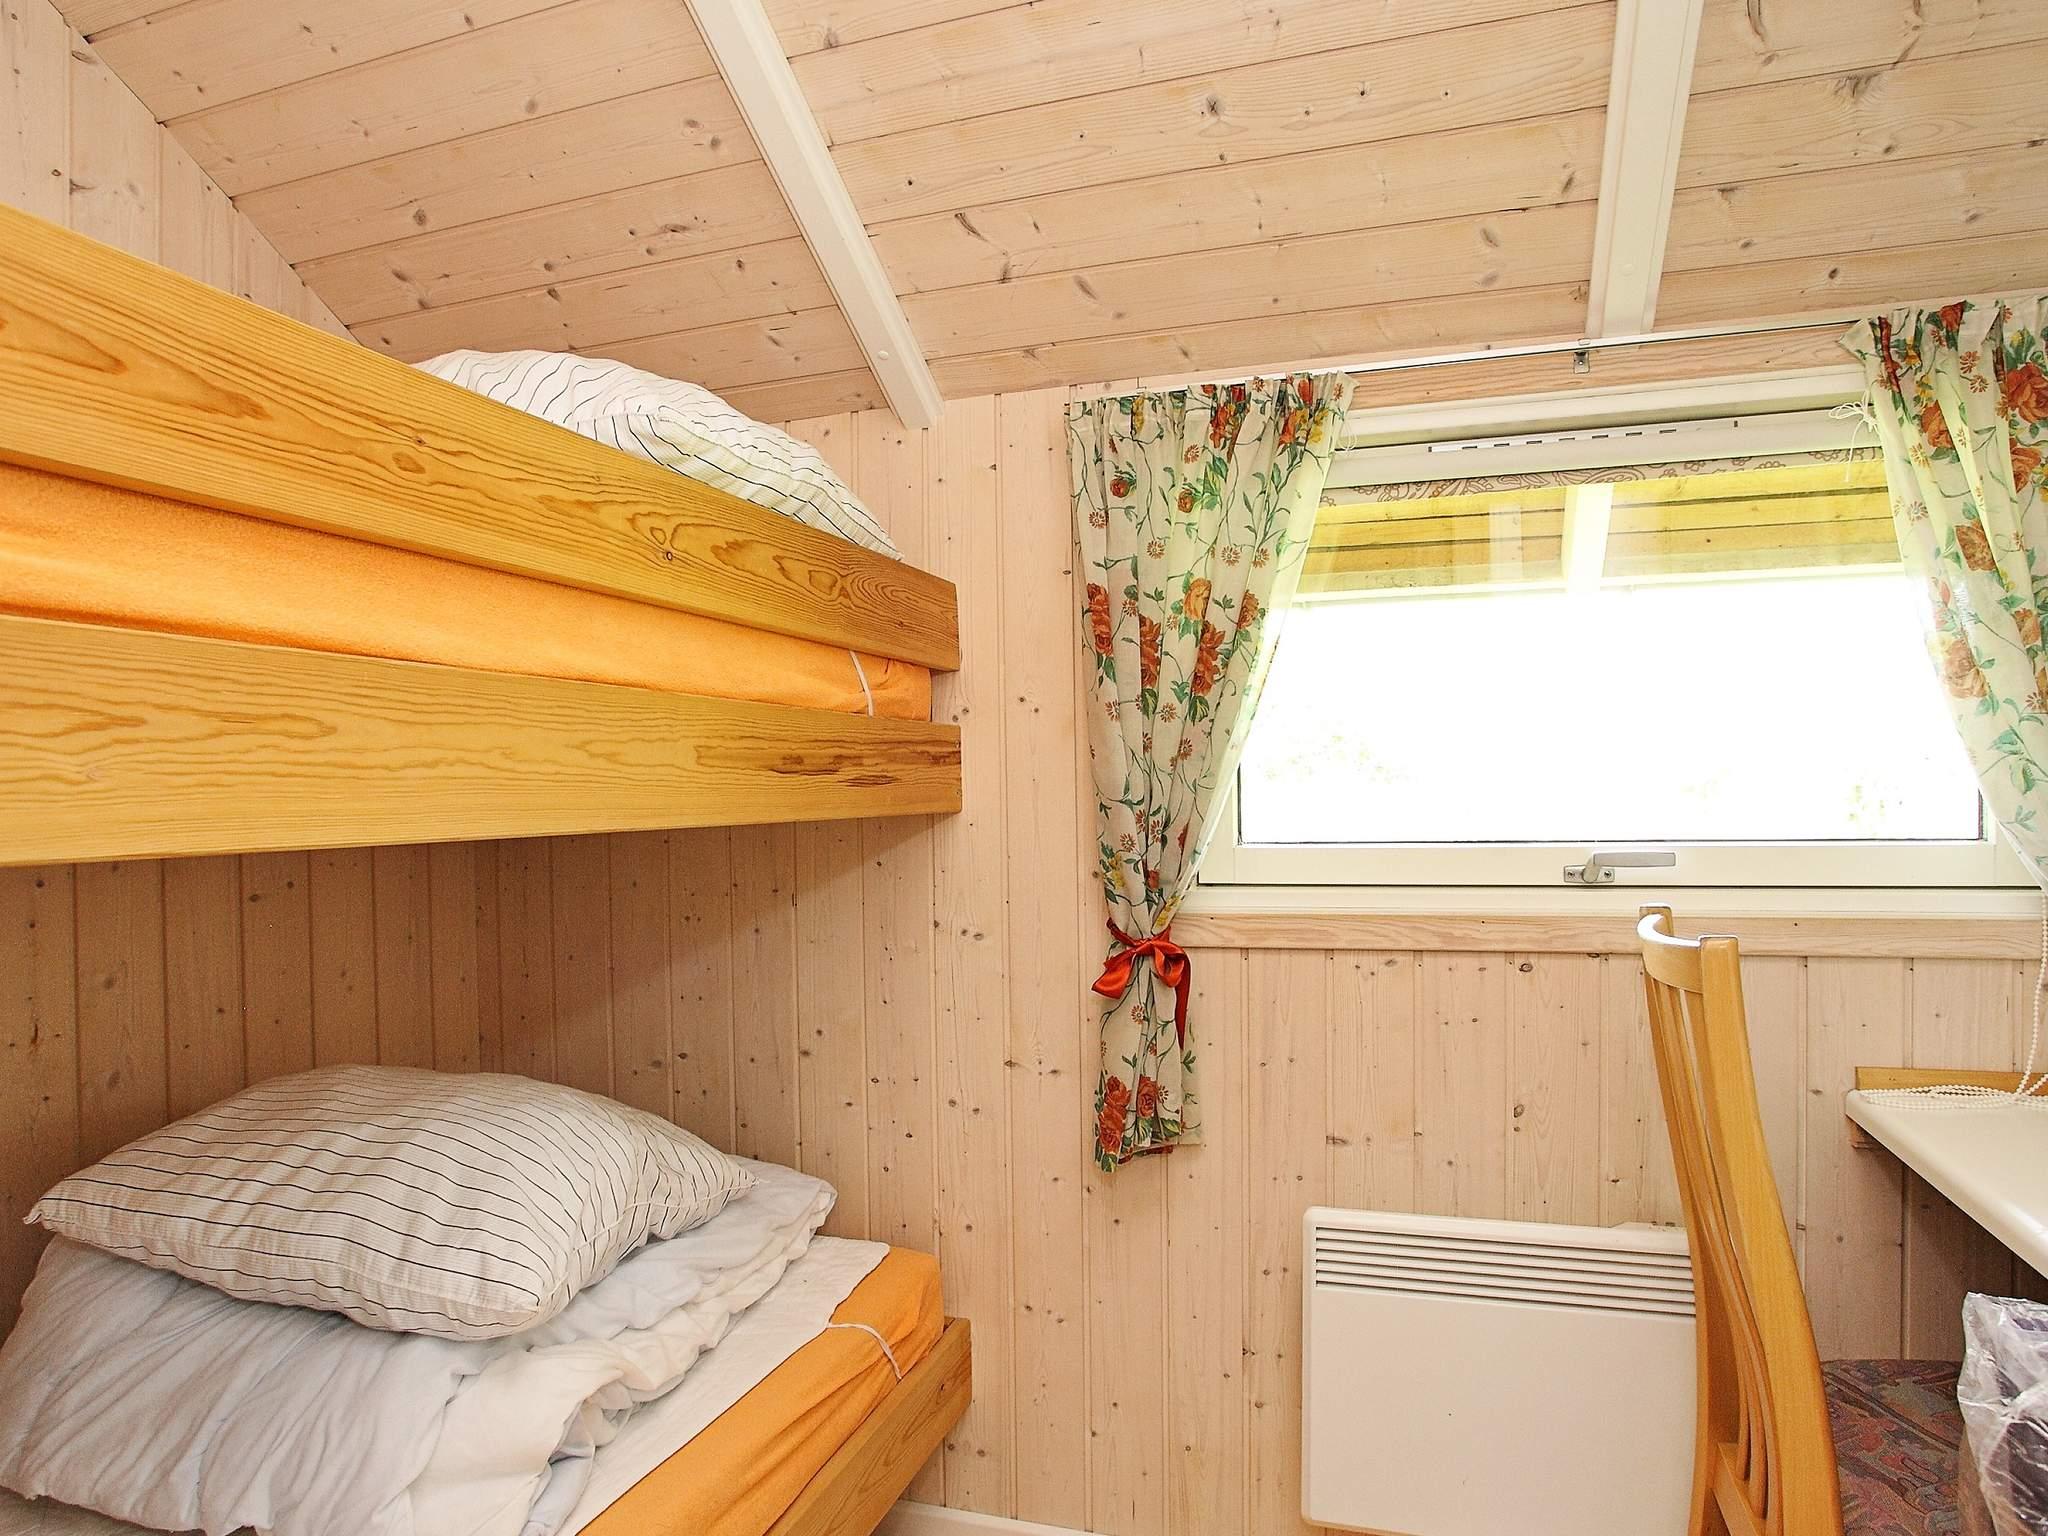 Ferienhaus Bratten Strand (82588), Strandby, , Nordostjütland, Dänemark, Bild 6